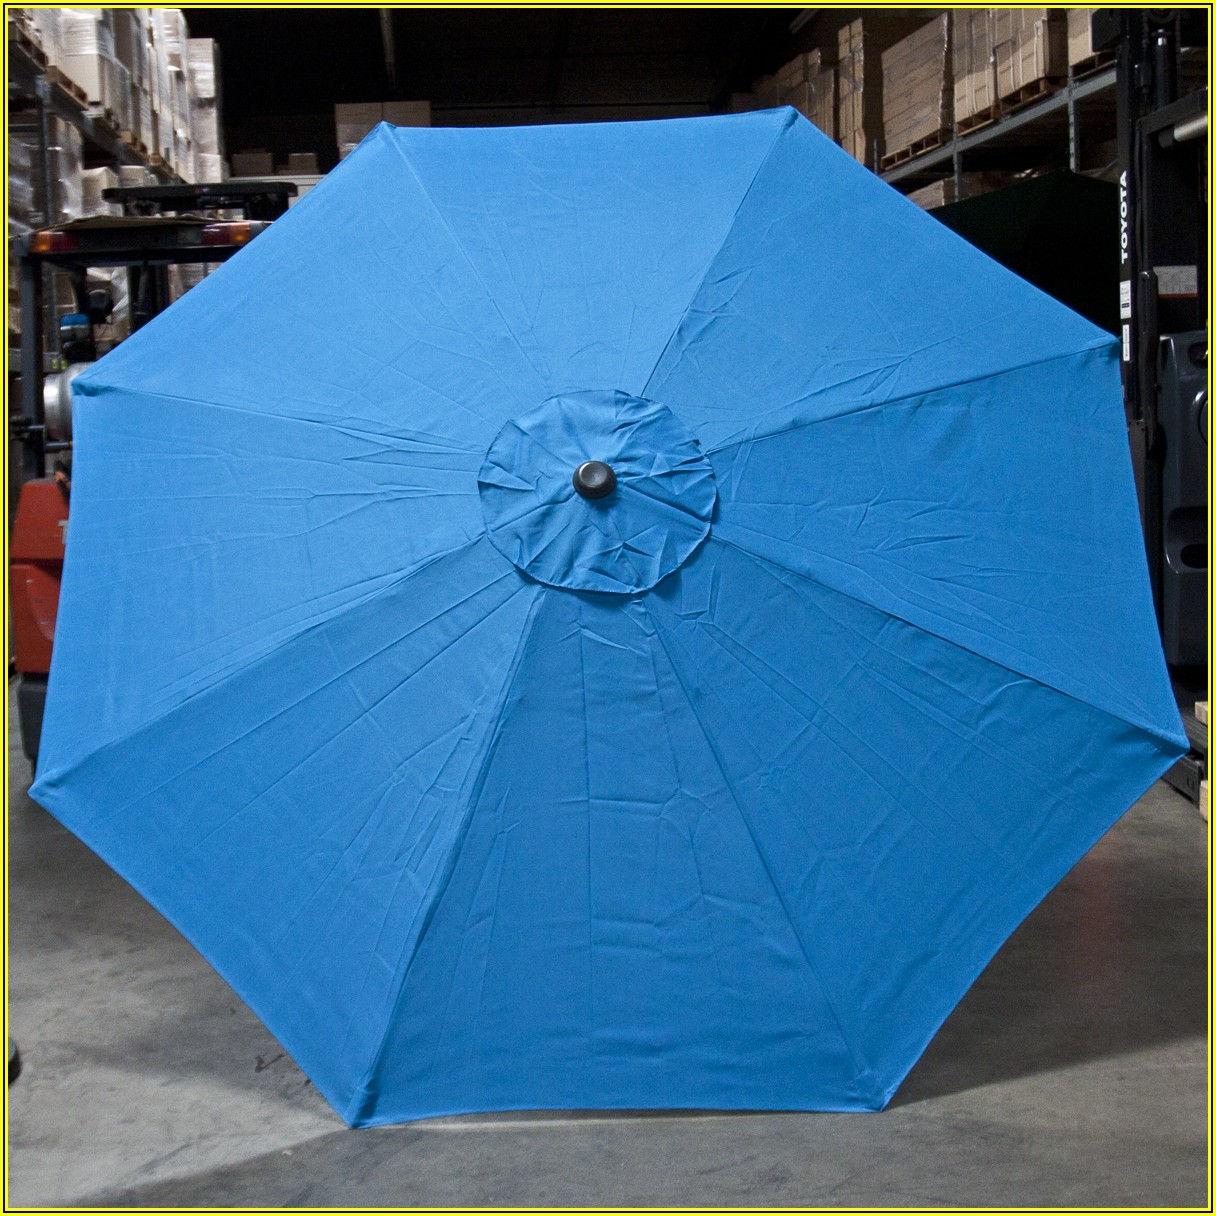 Replacement Canopy For Patio Umbrella 8 Rib